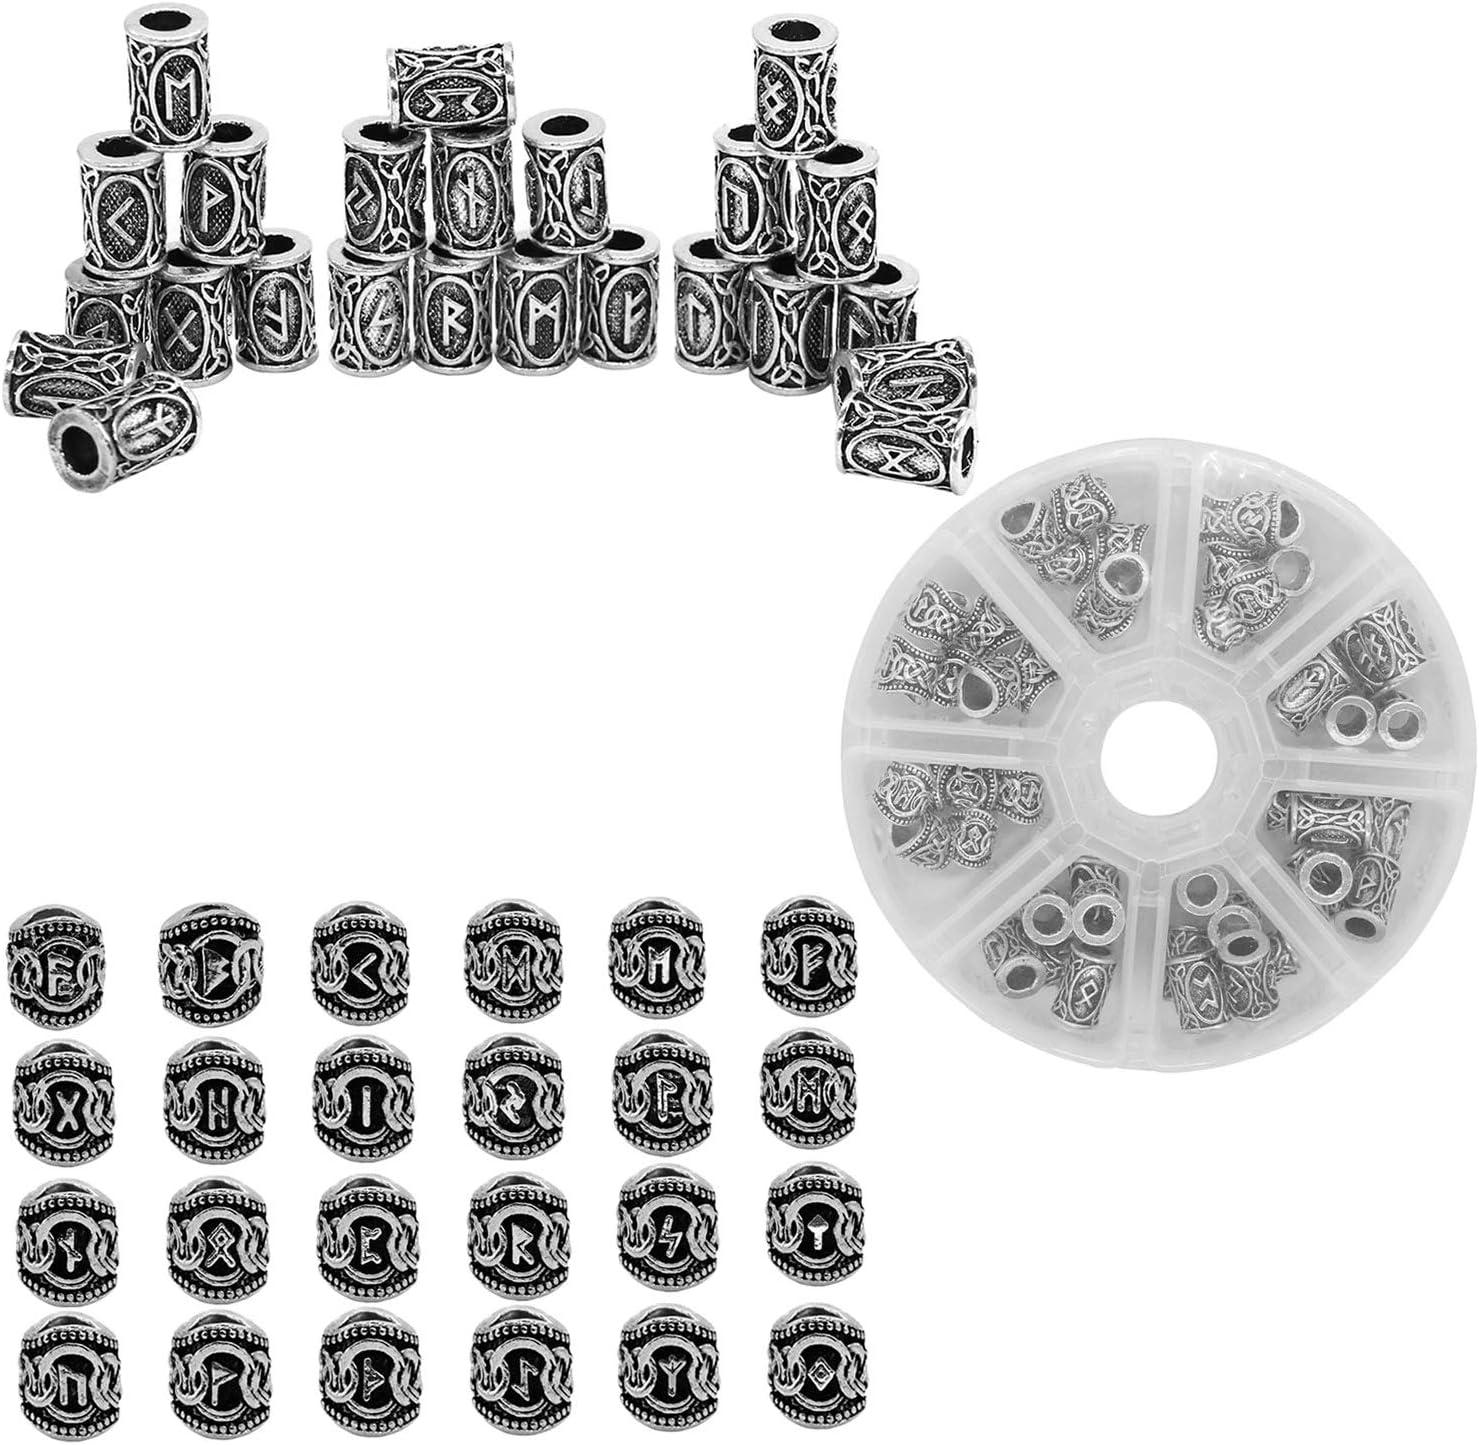 B Baosity Set de 48 cuentas de vikingo de plata, perlas de tubo nórdico para rastas, peinados, colas de caballo, peinados de boda